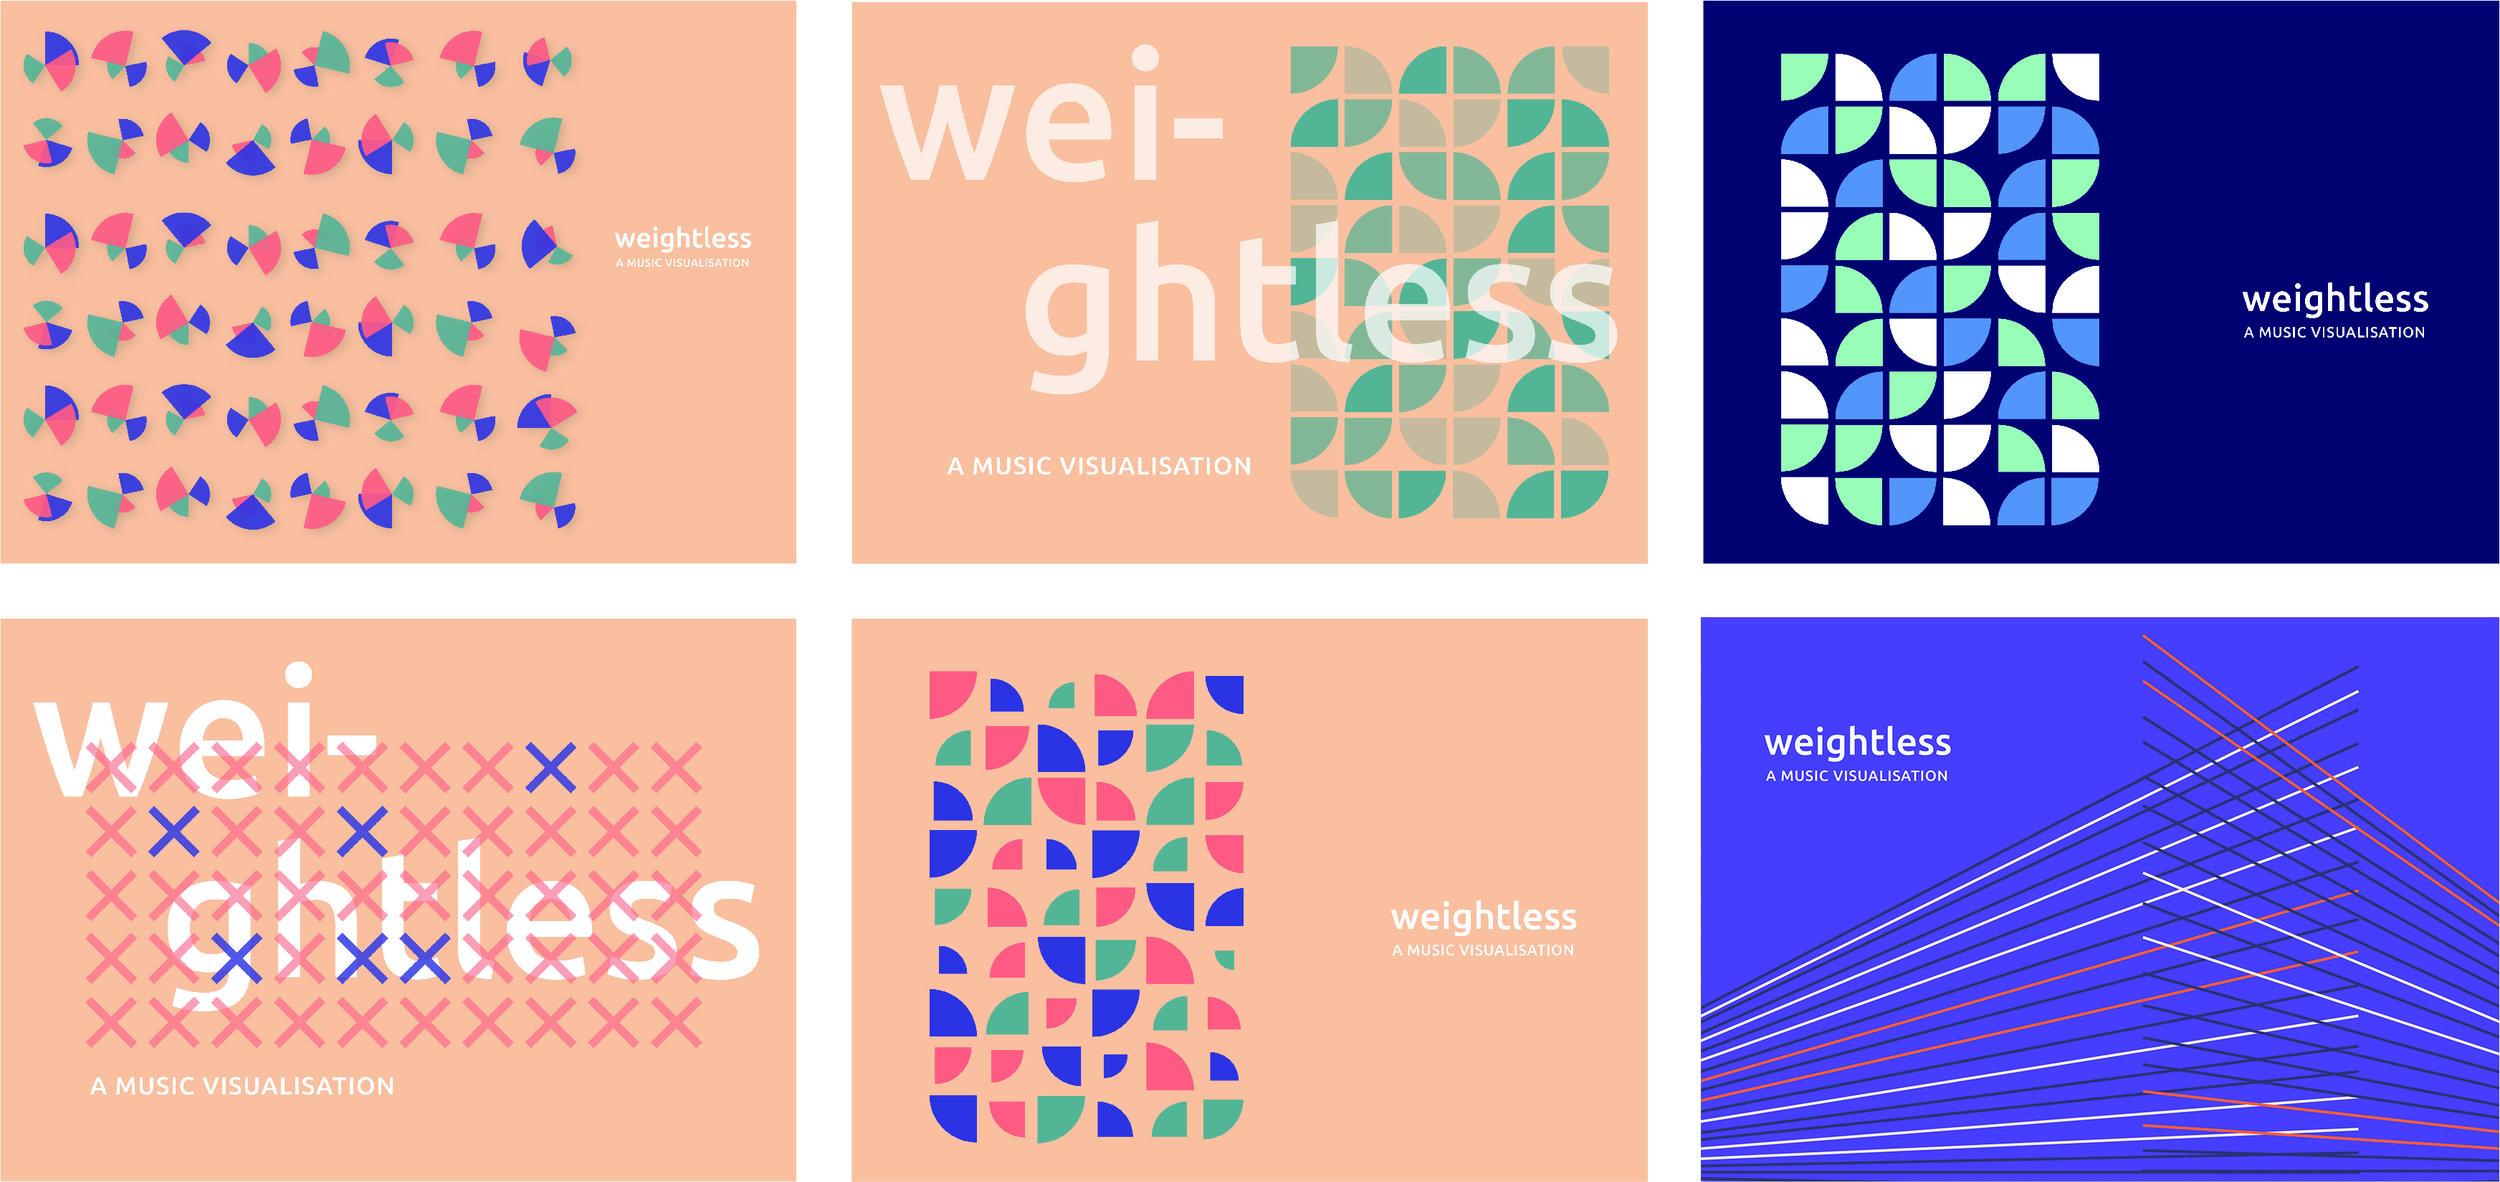 Digital concepts for design direction.